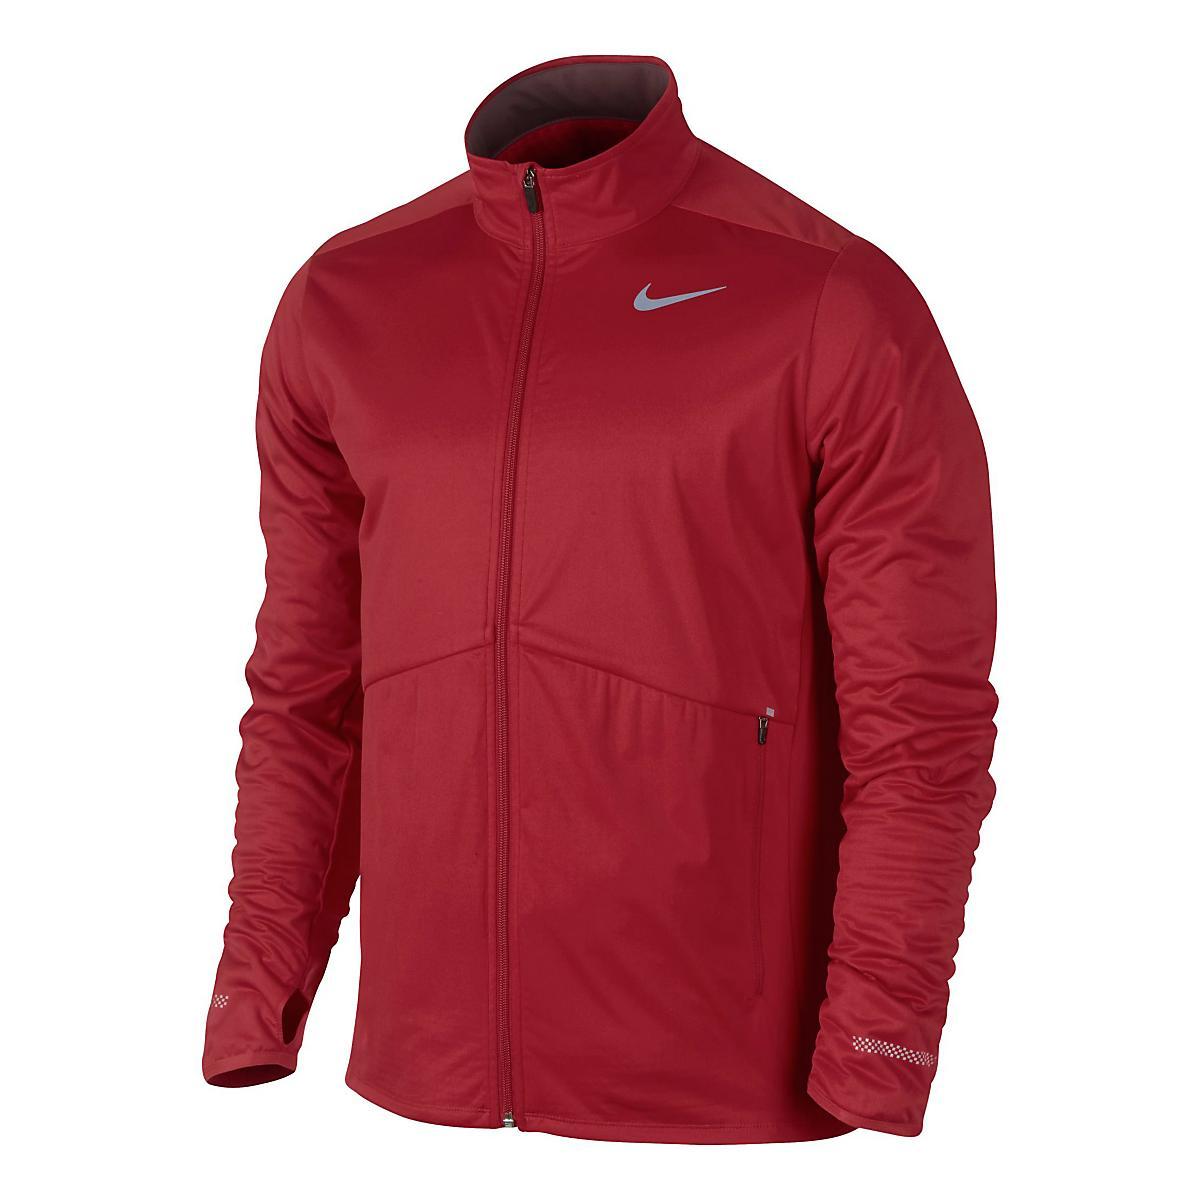 Men's Nike�Element Shield Full Zip